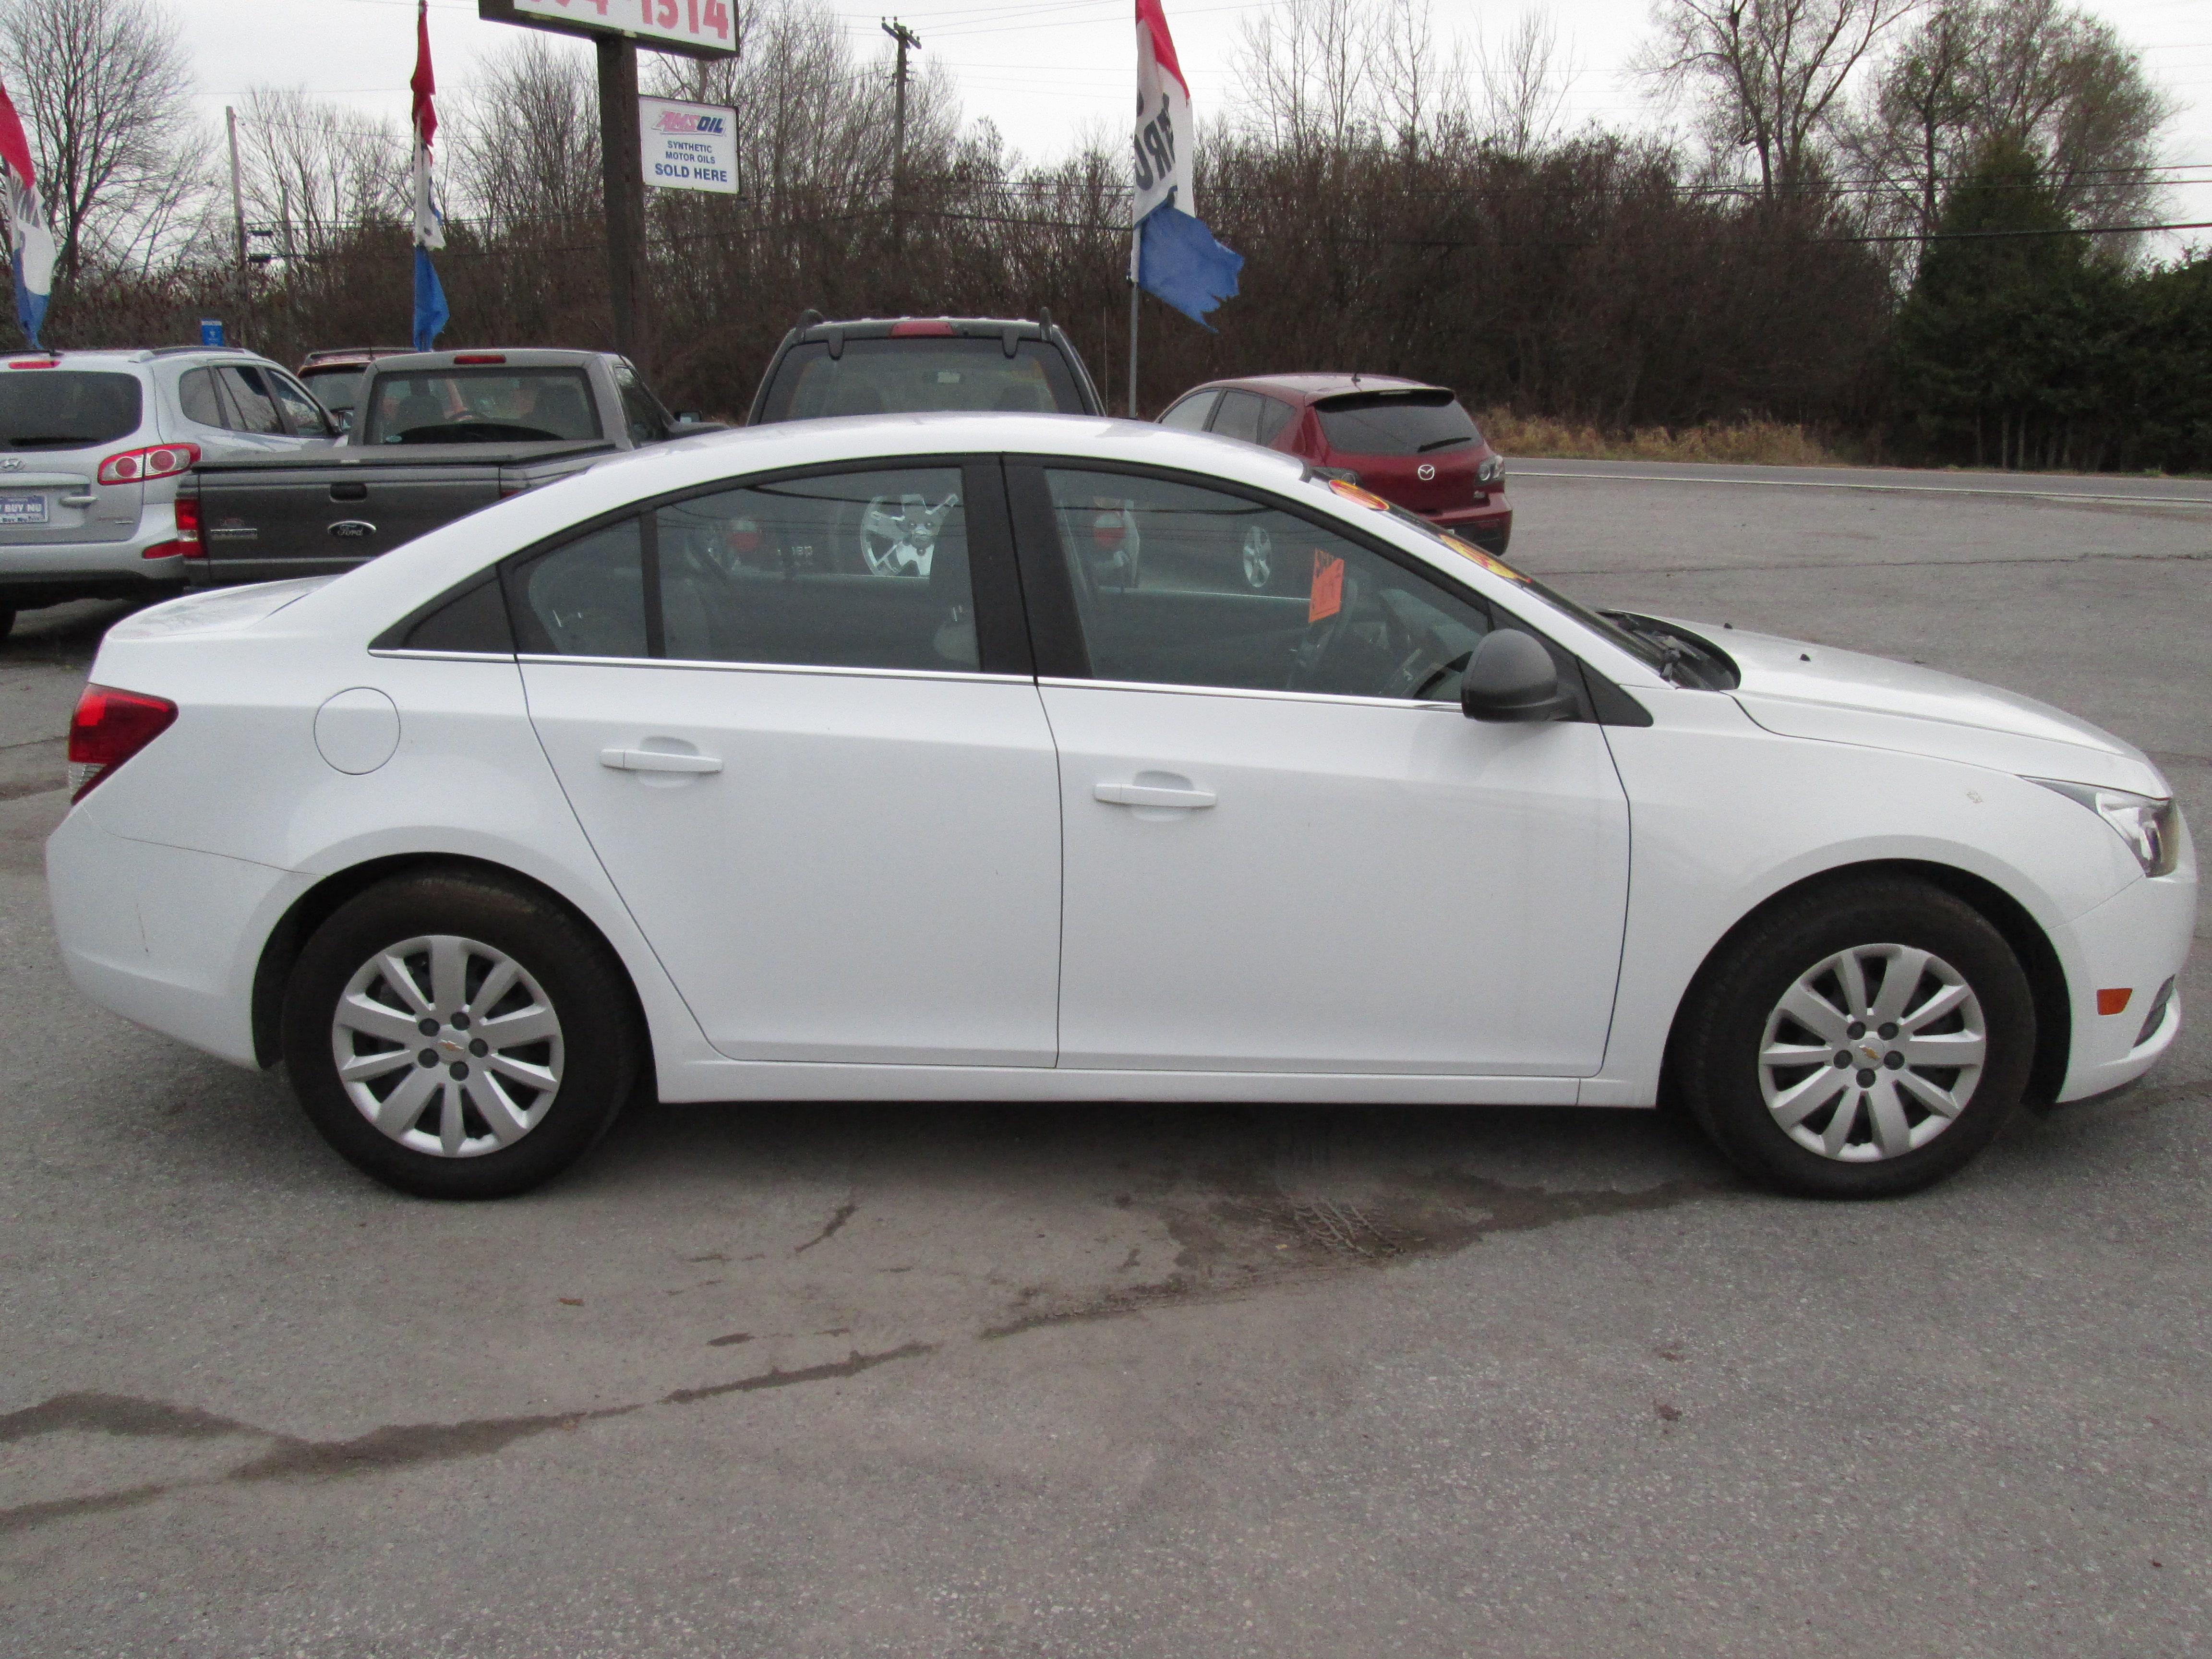 Y Buy Nu 2011 Chevrolet Cruze Ls Why Buy New